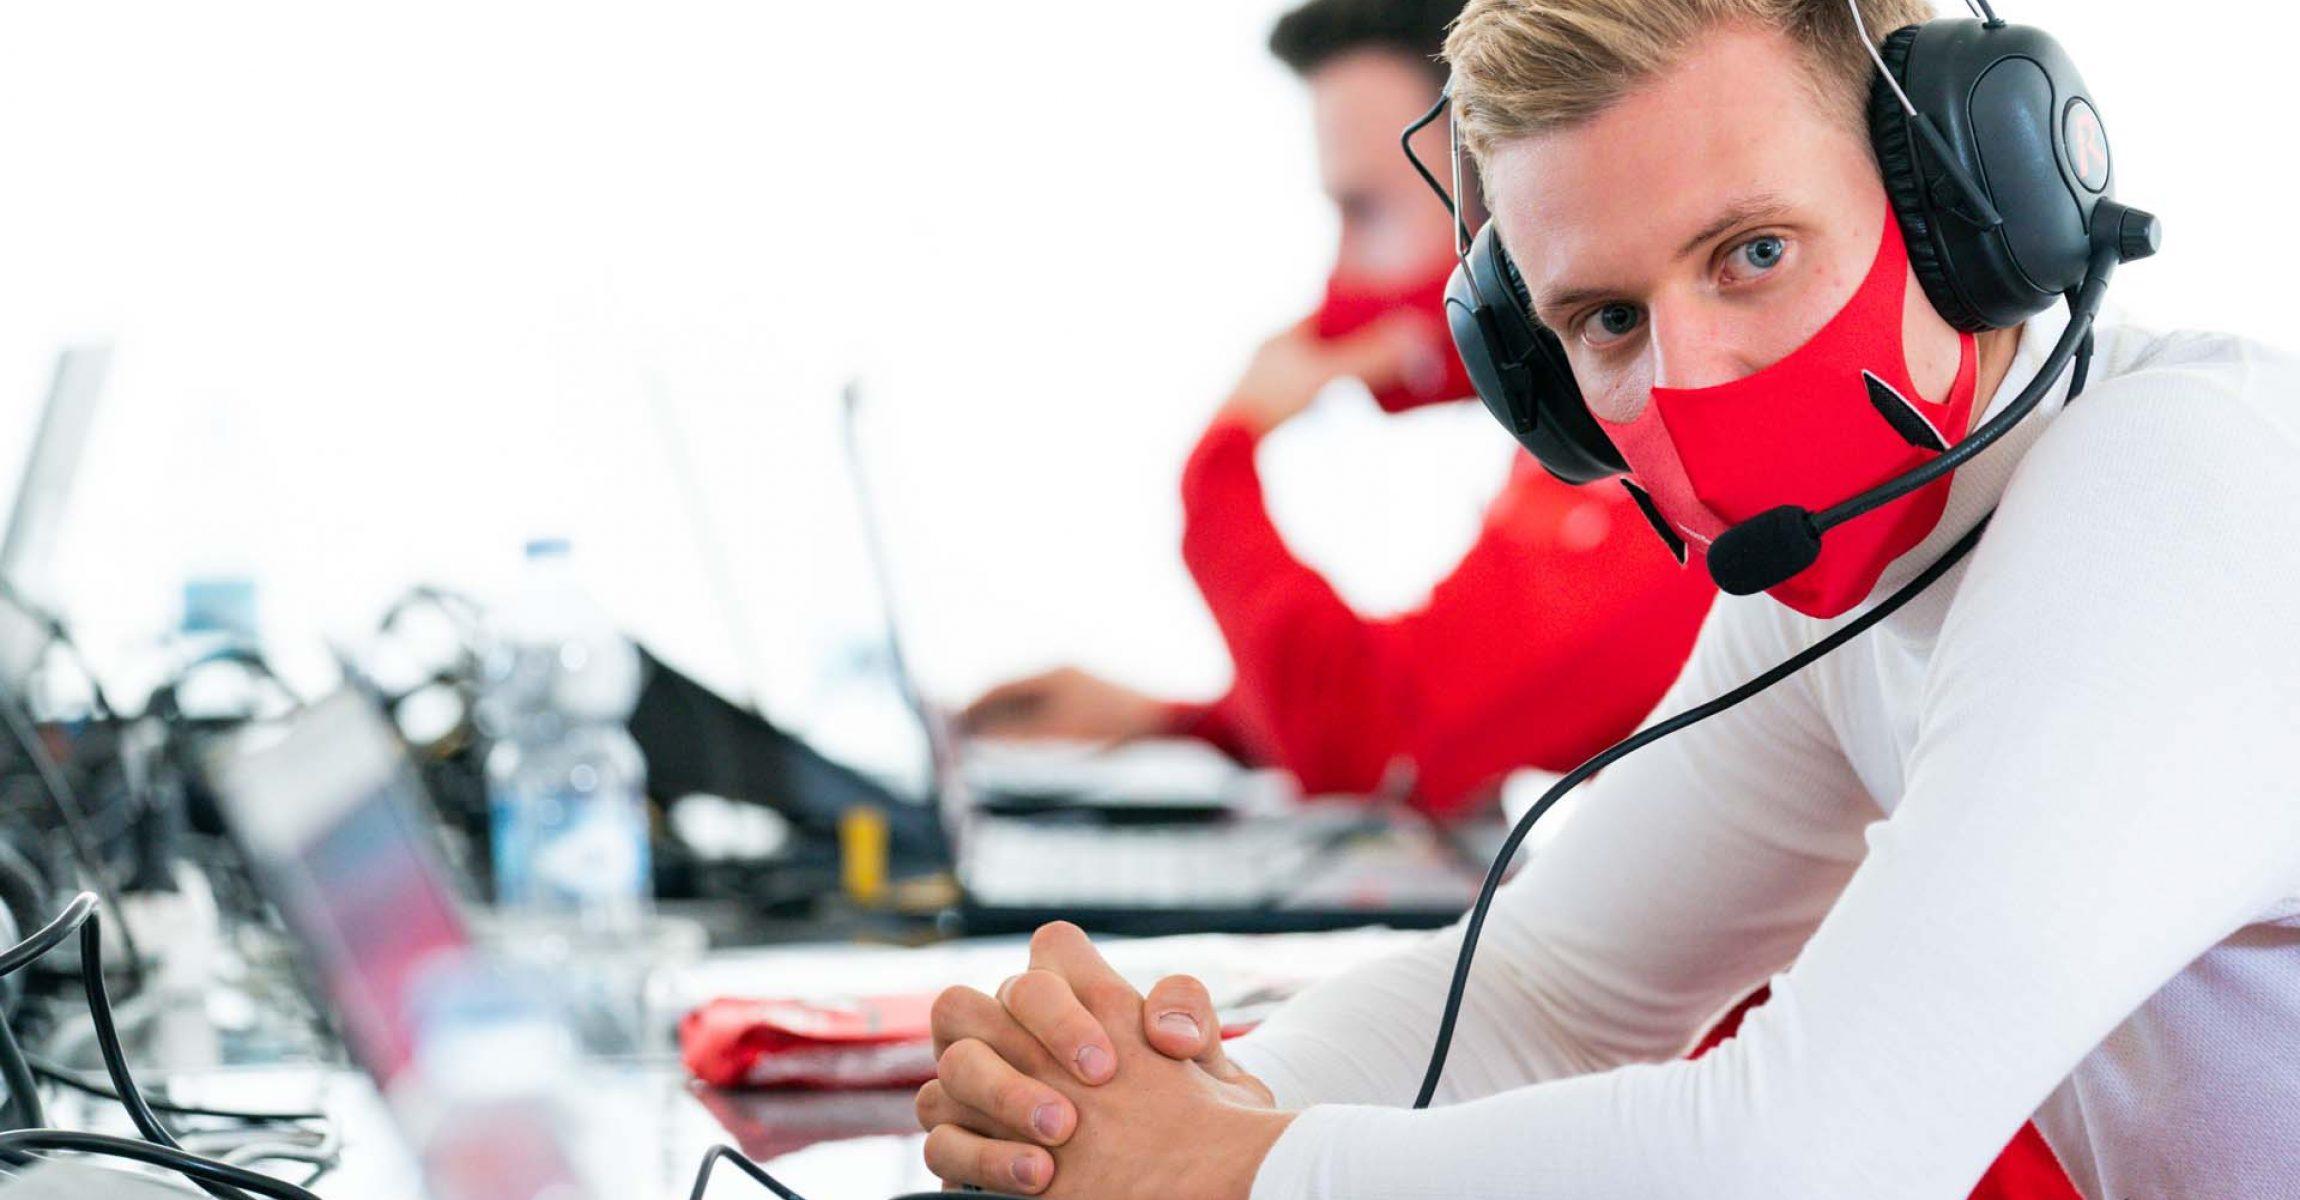 Mick Schumacher, Ferrari, Fiorano, test